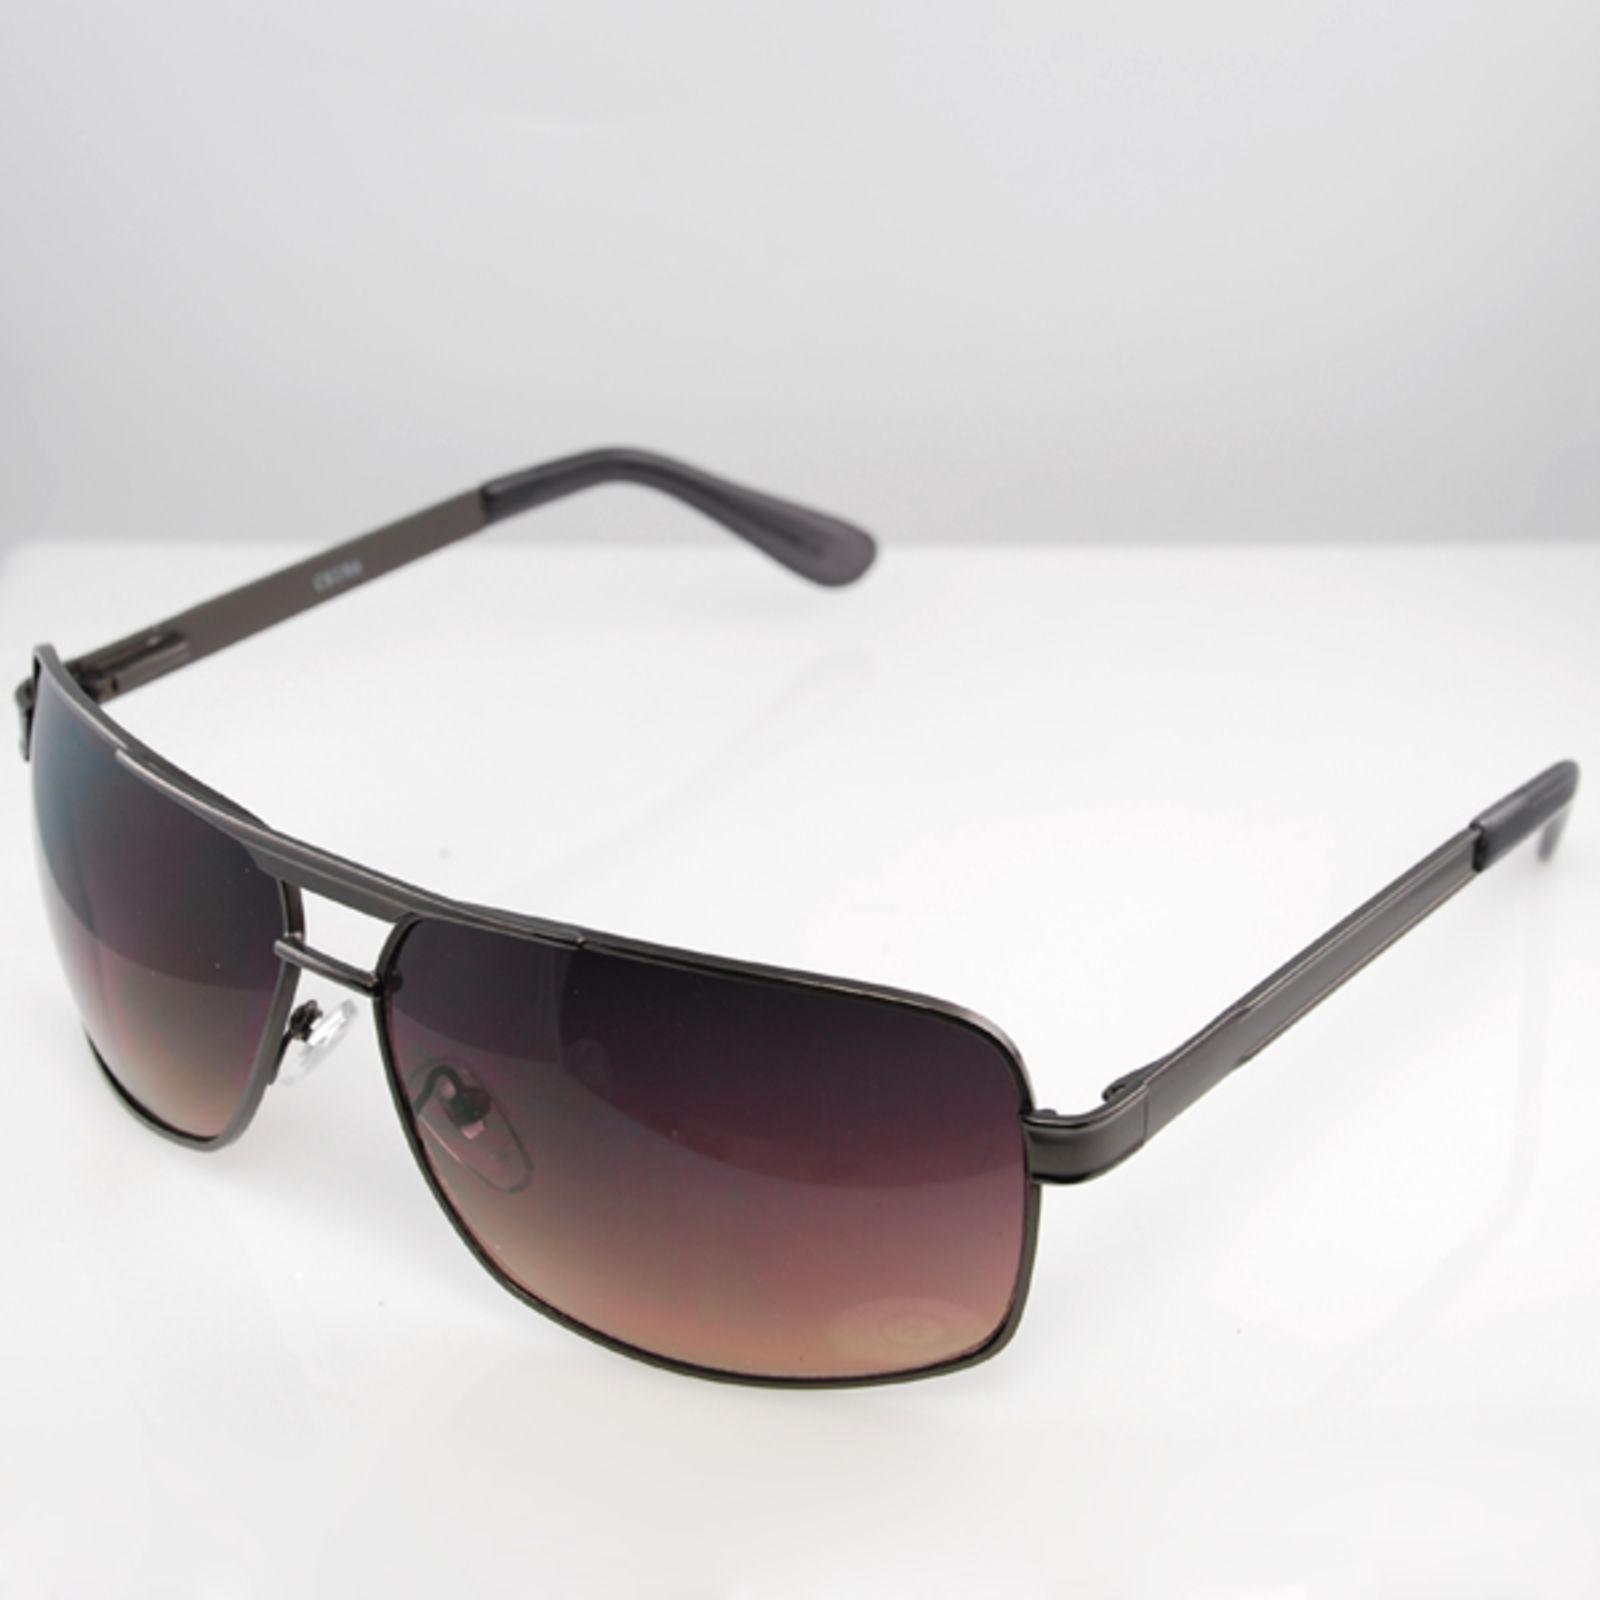 15745a149b1b Sorte Store Moderne Solbriller